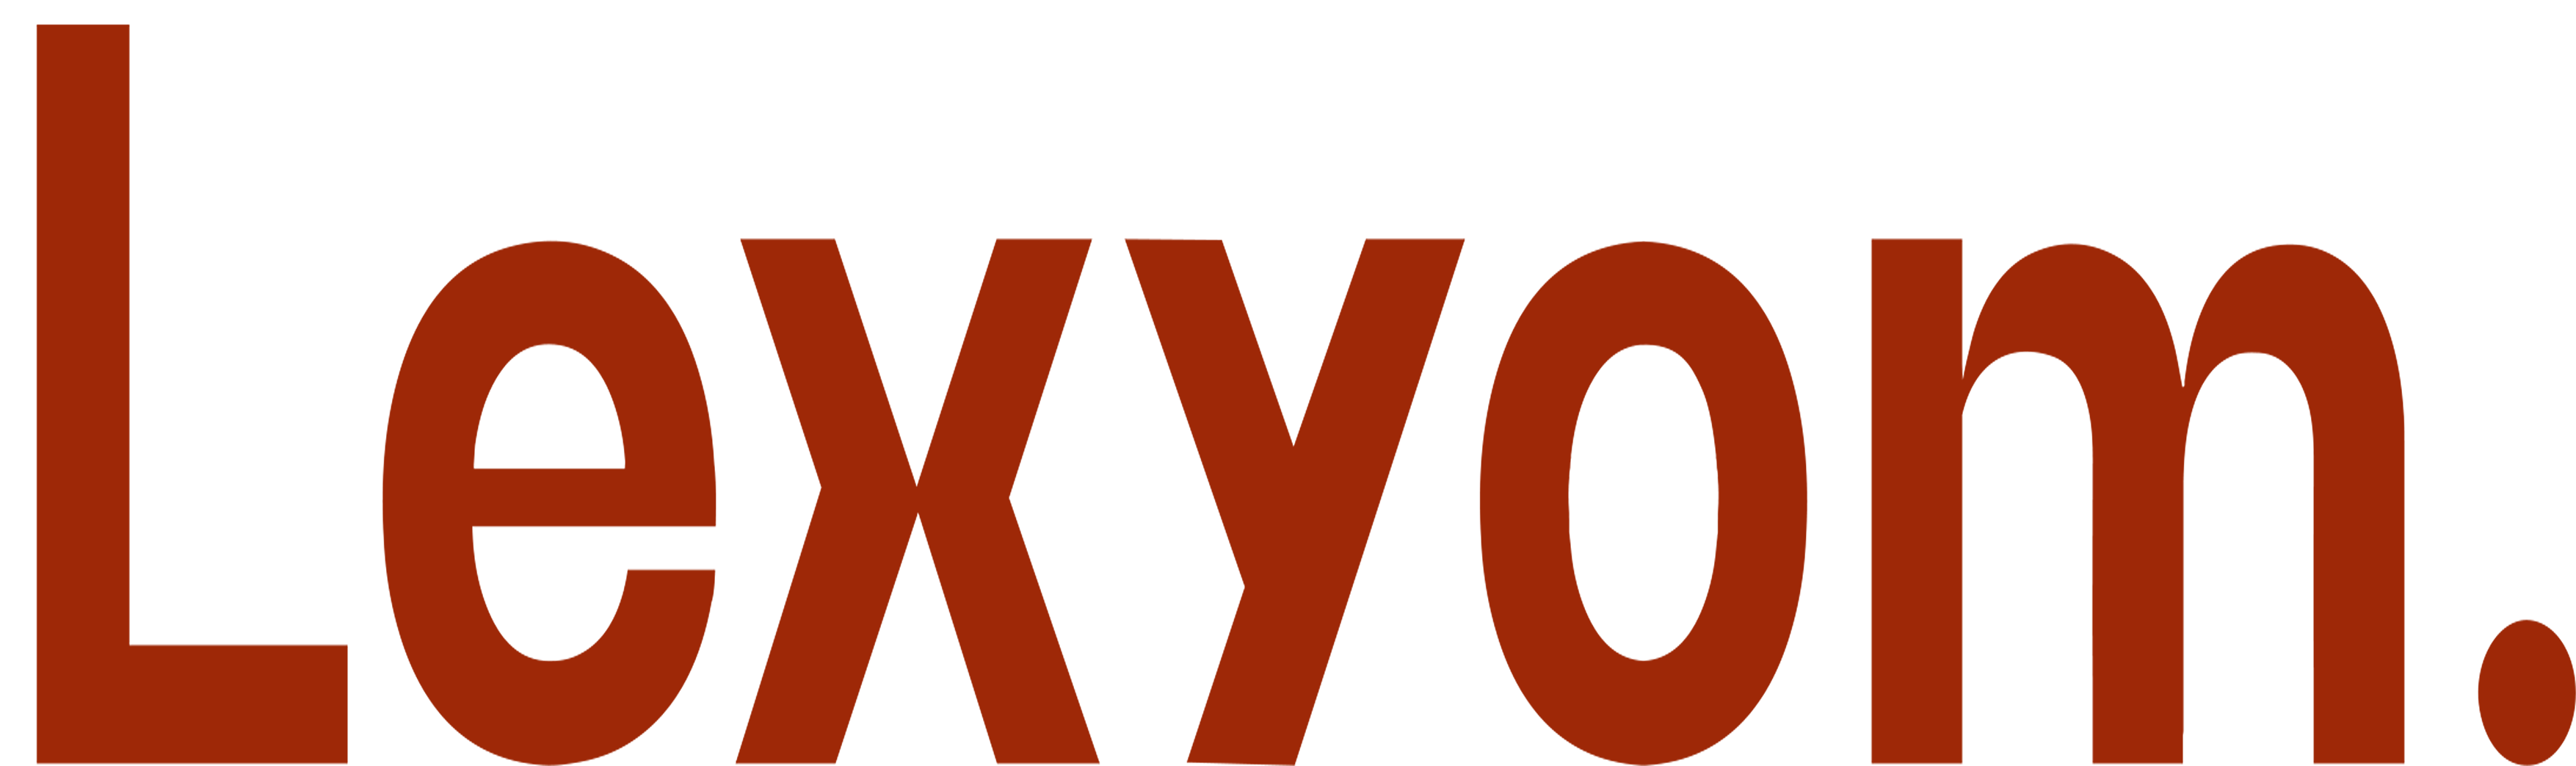 Lexyom